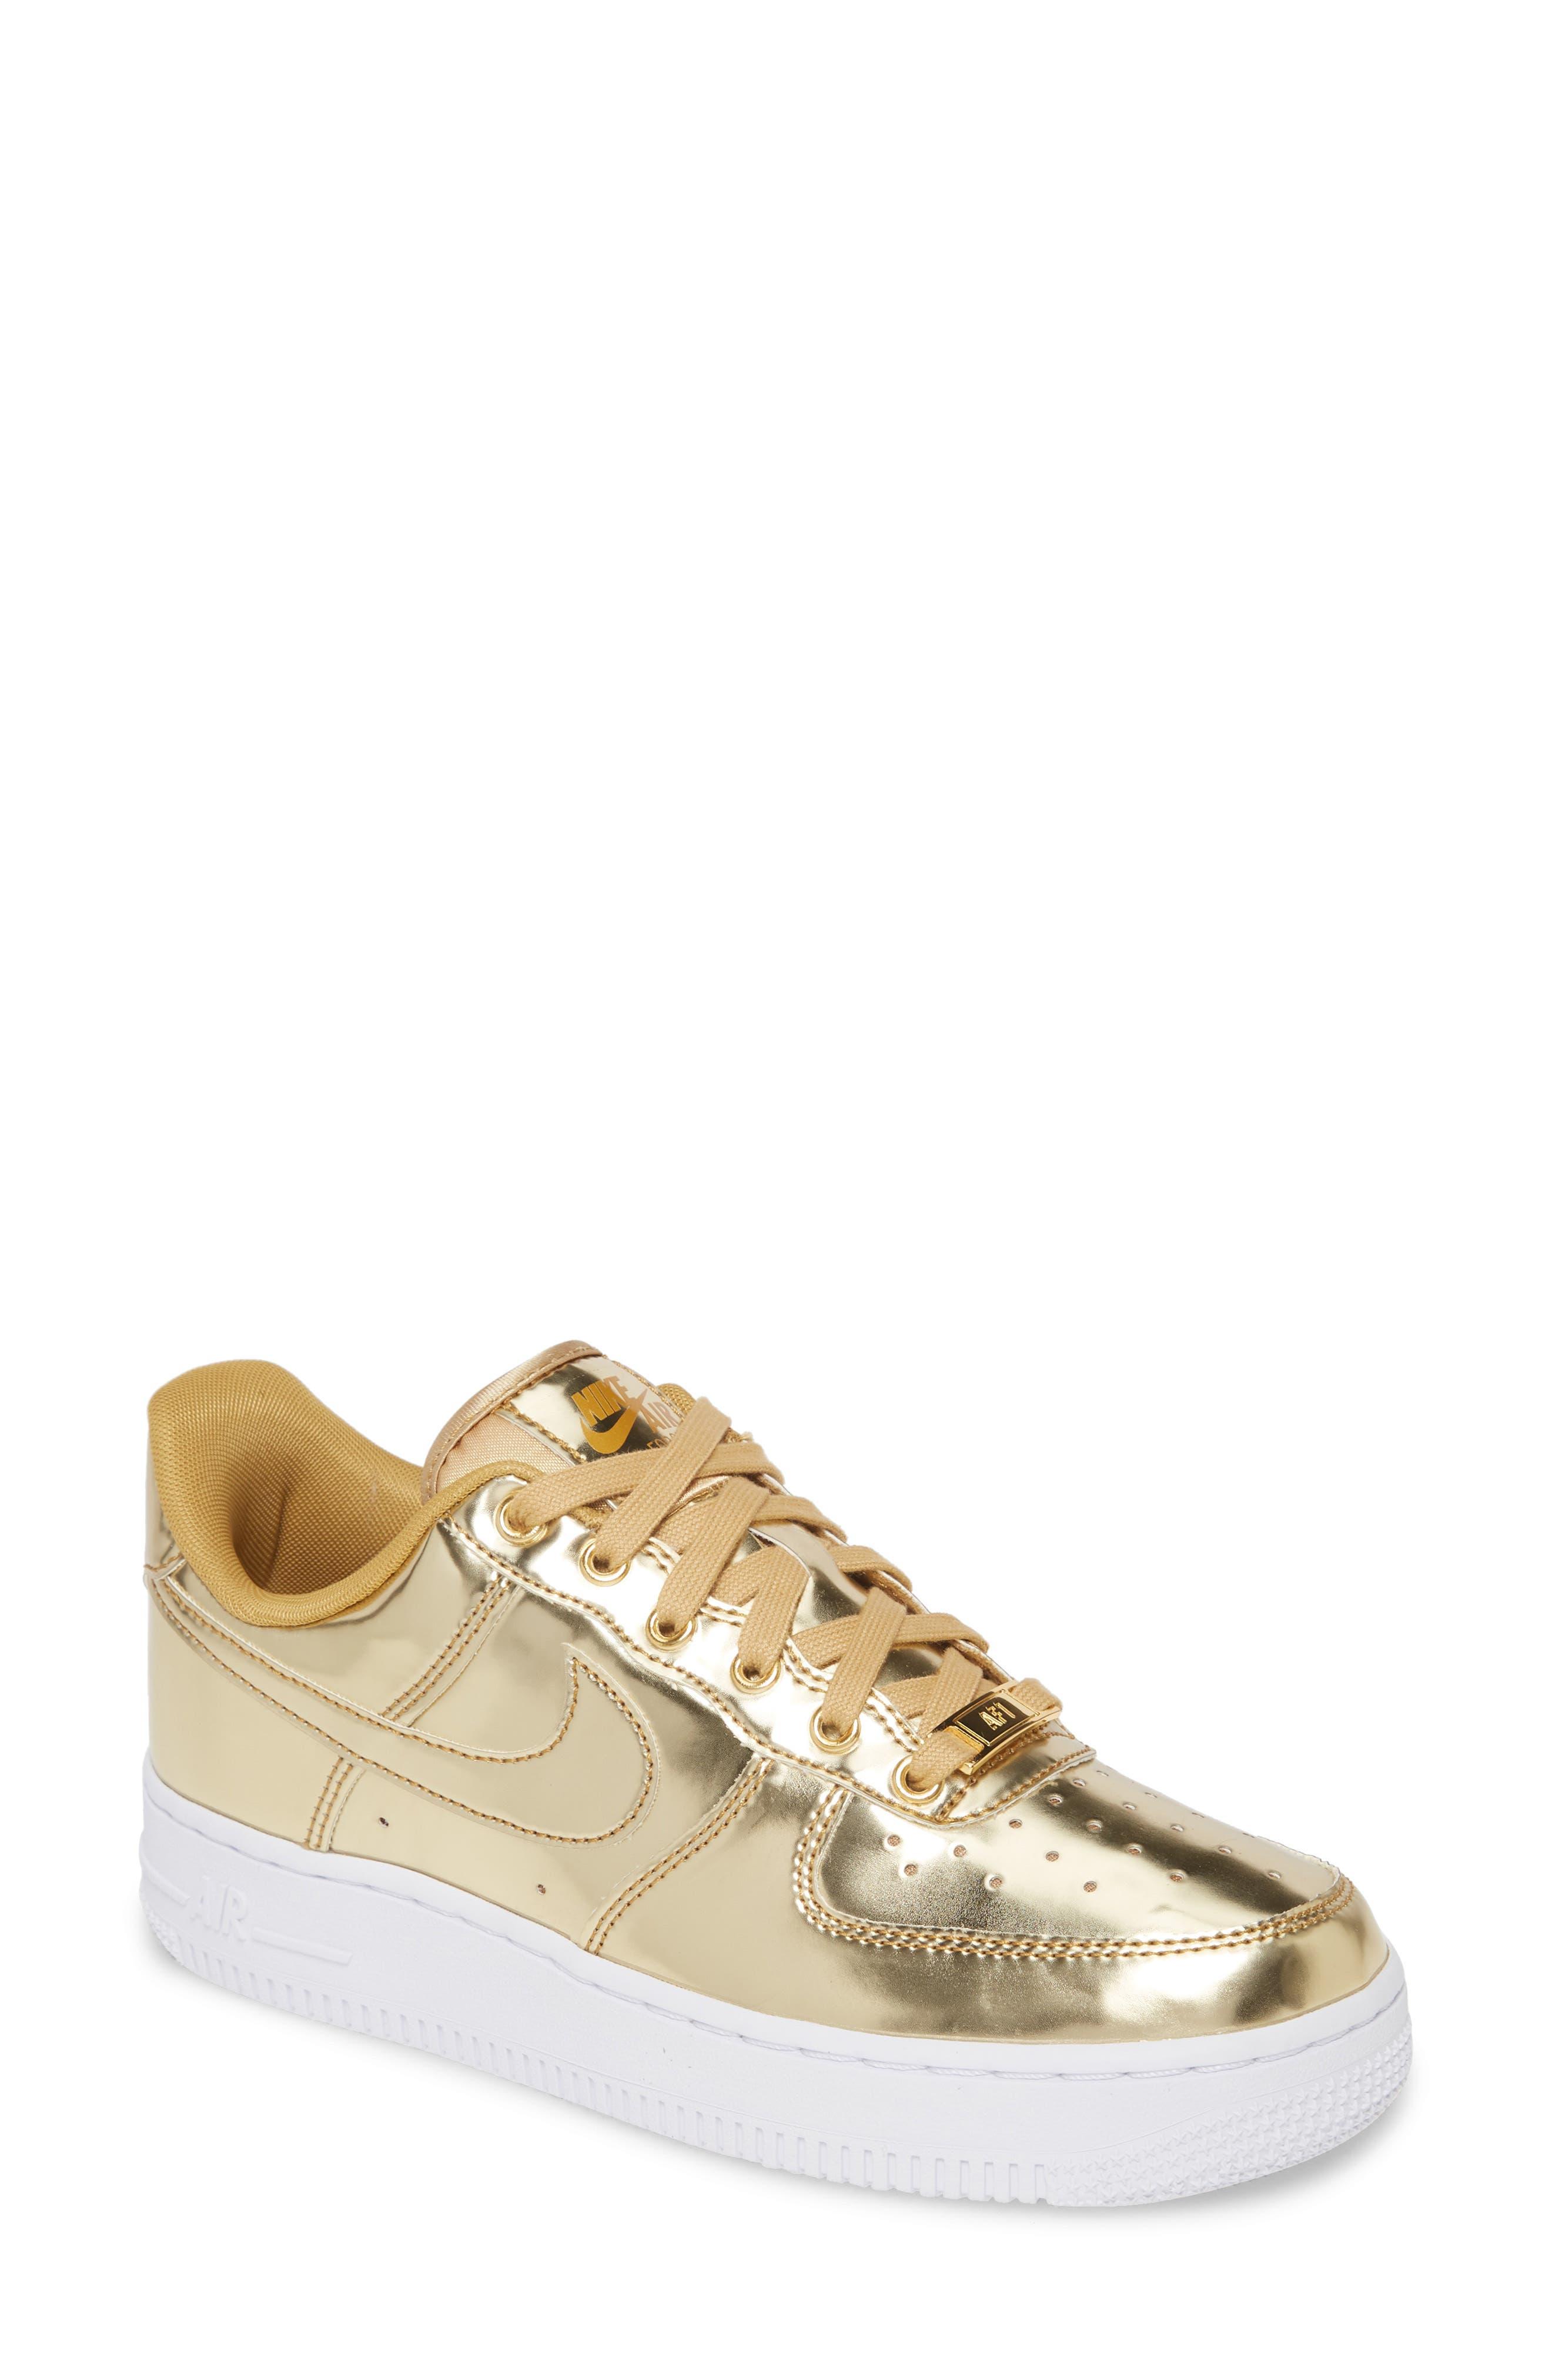 Nike | Nordstrom